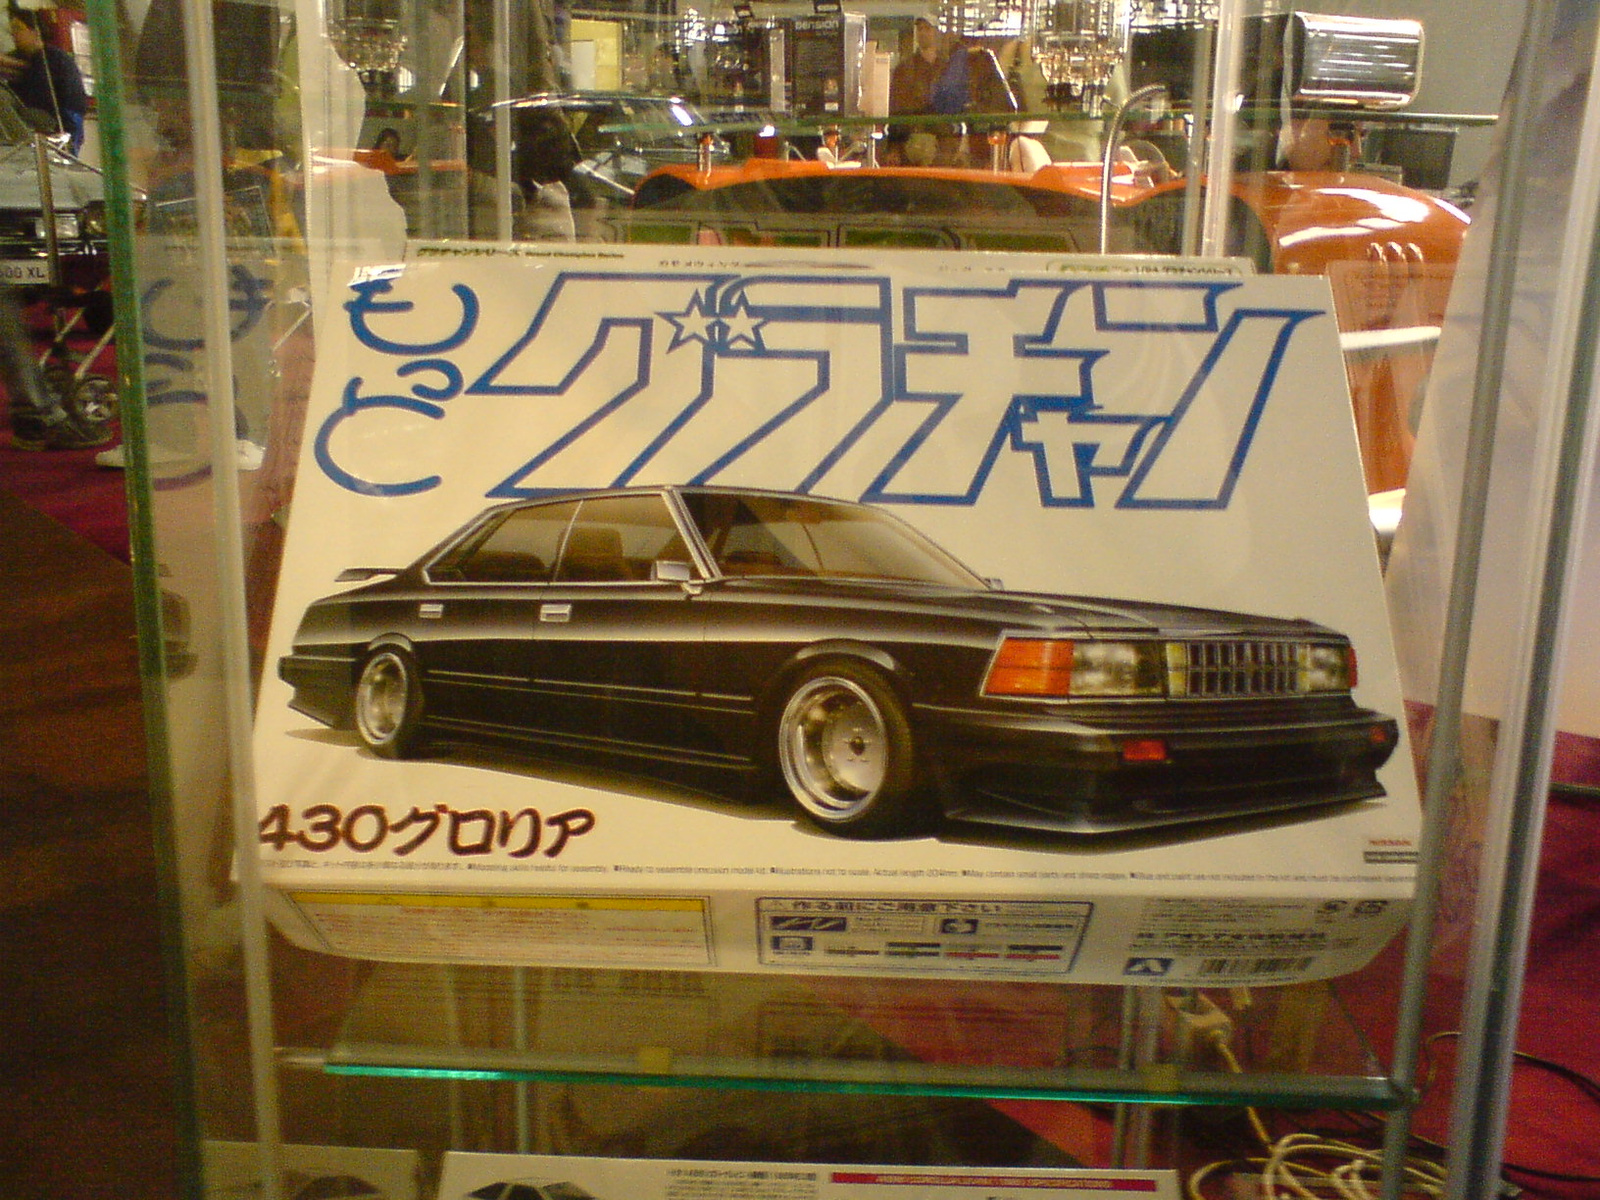 Nissan Cedric (430)